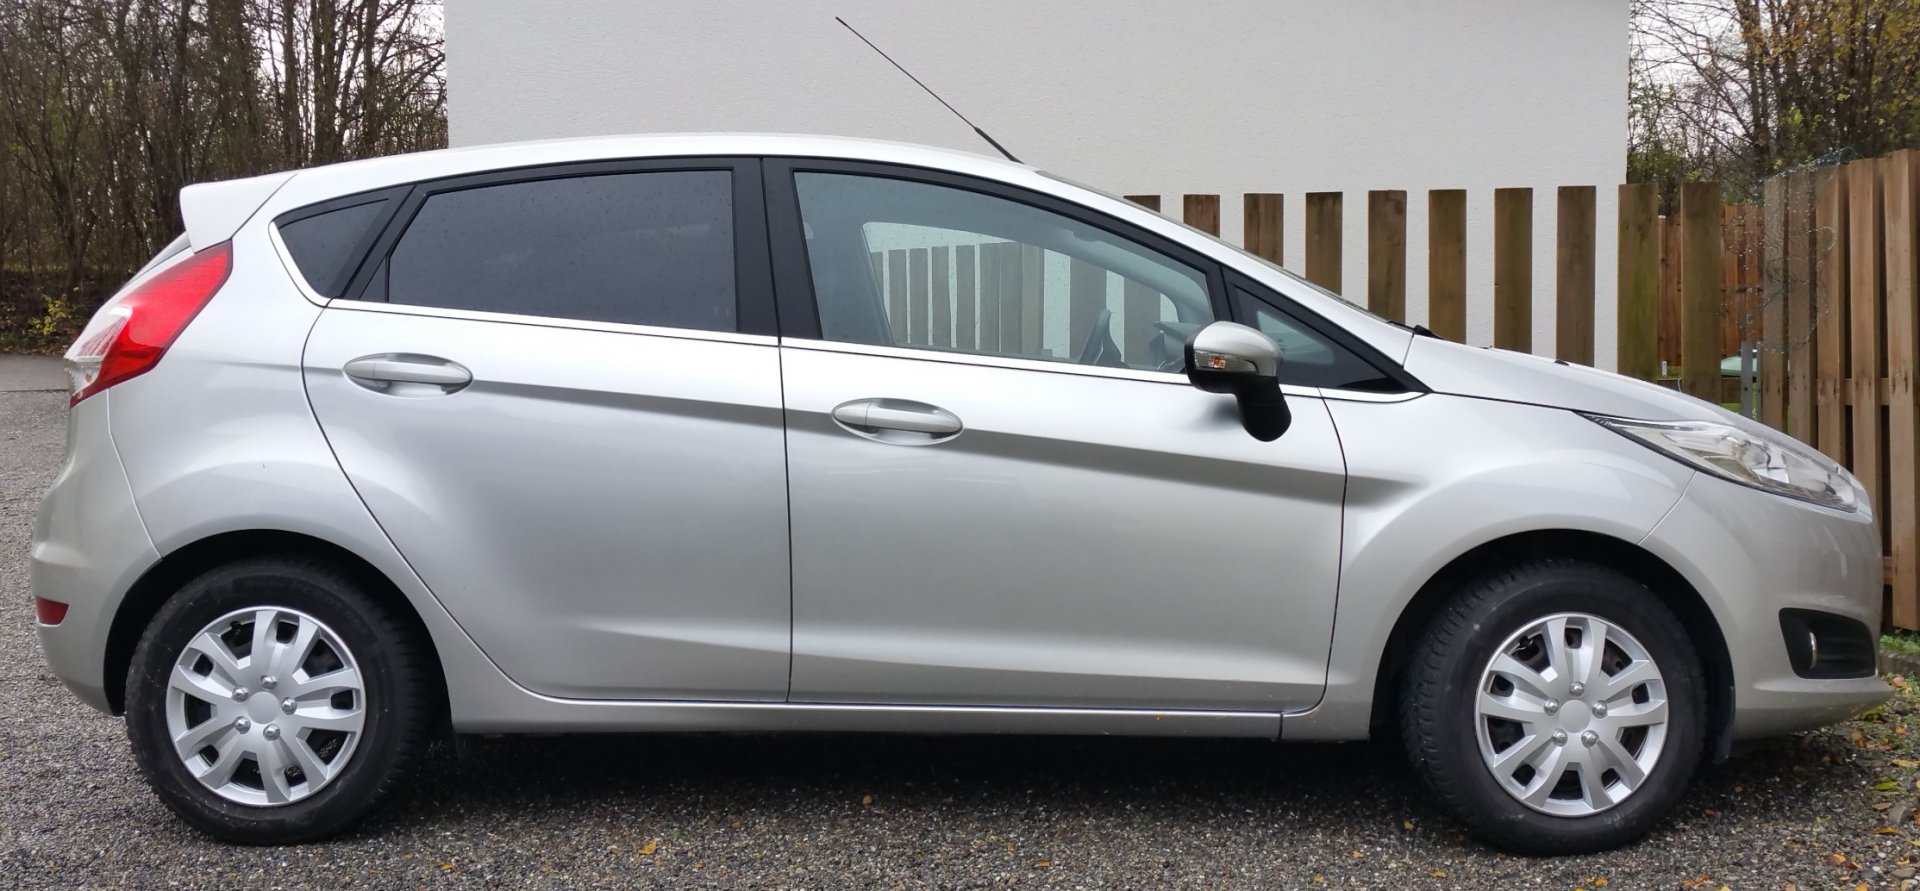 Fiesta jpg